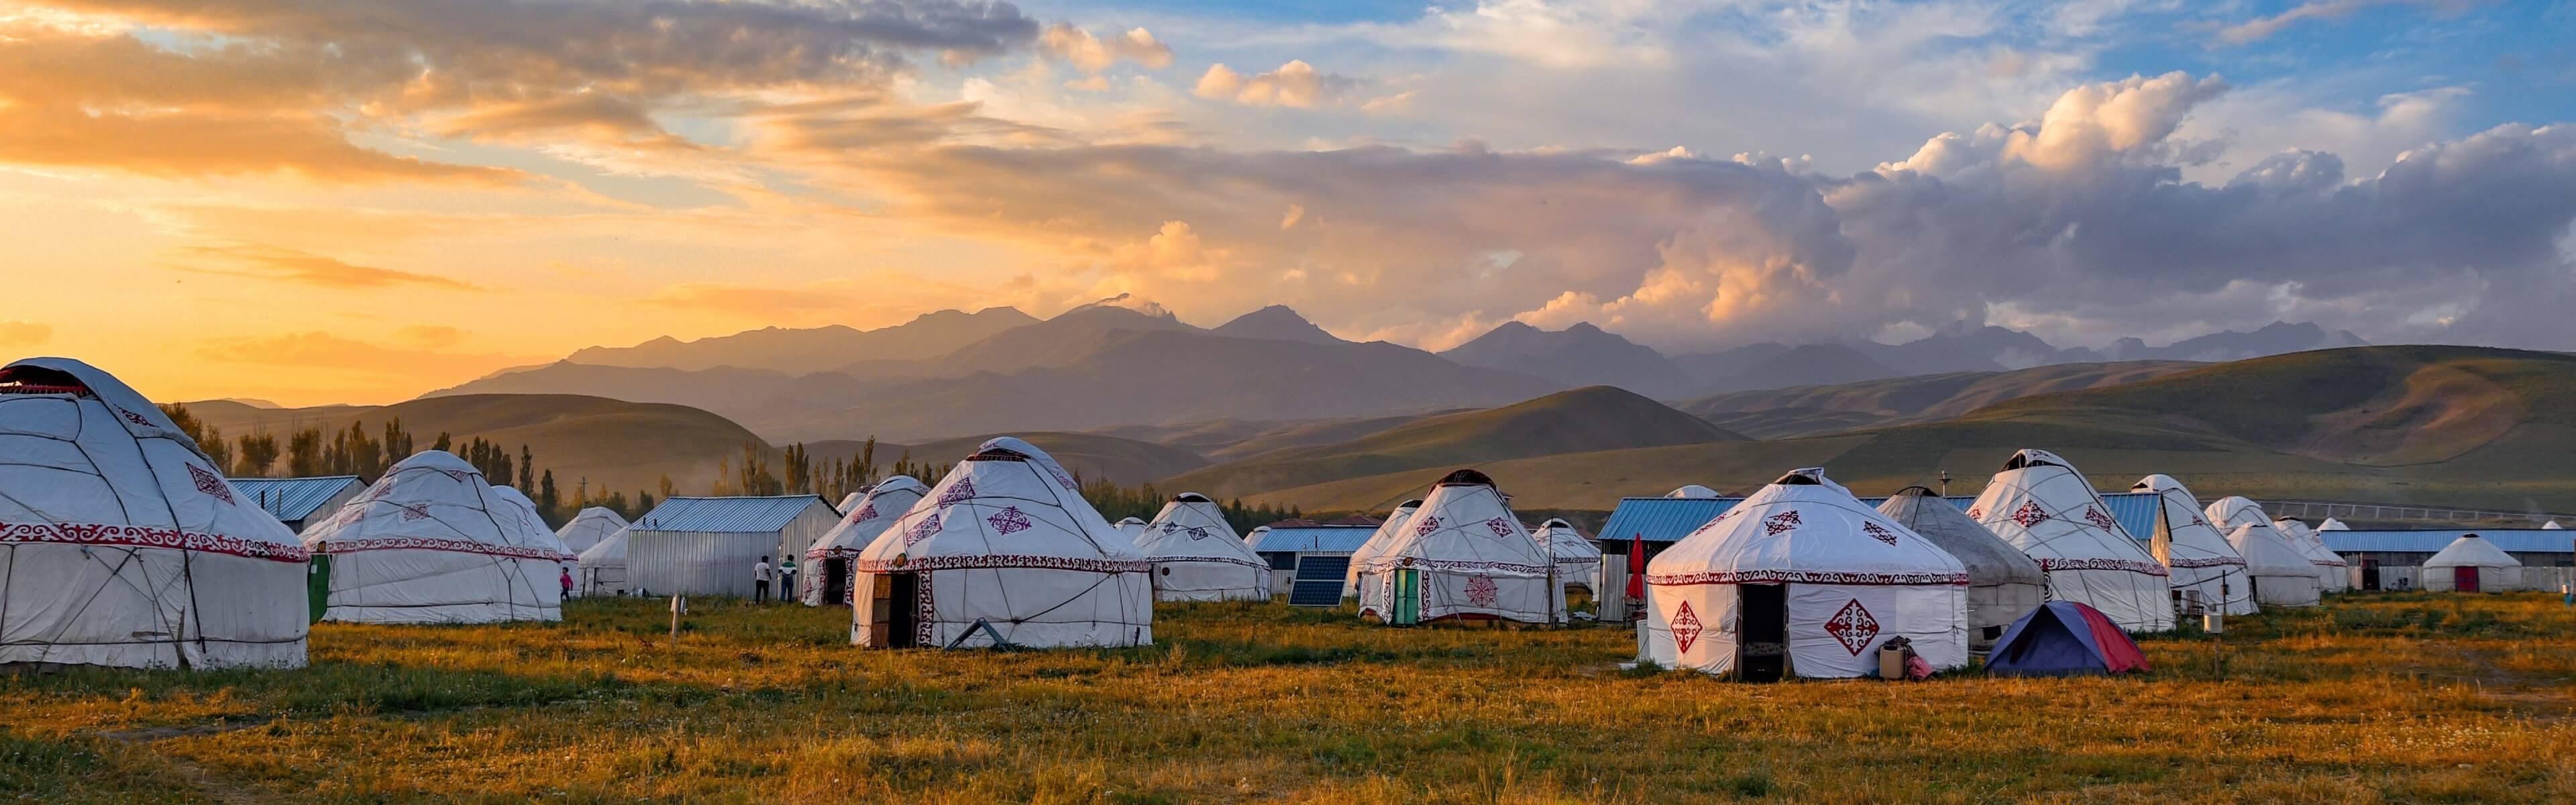 Traditional Mongolian yurts